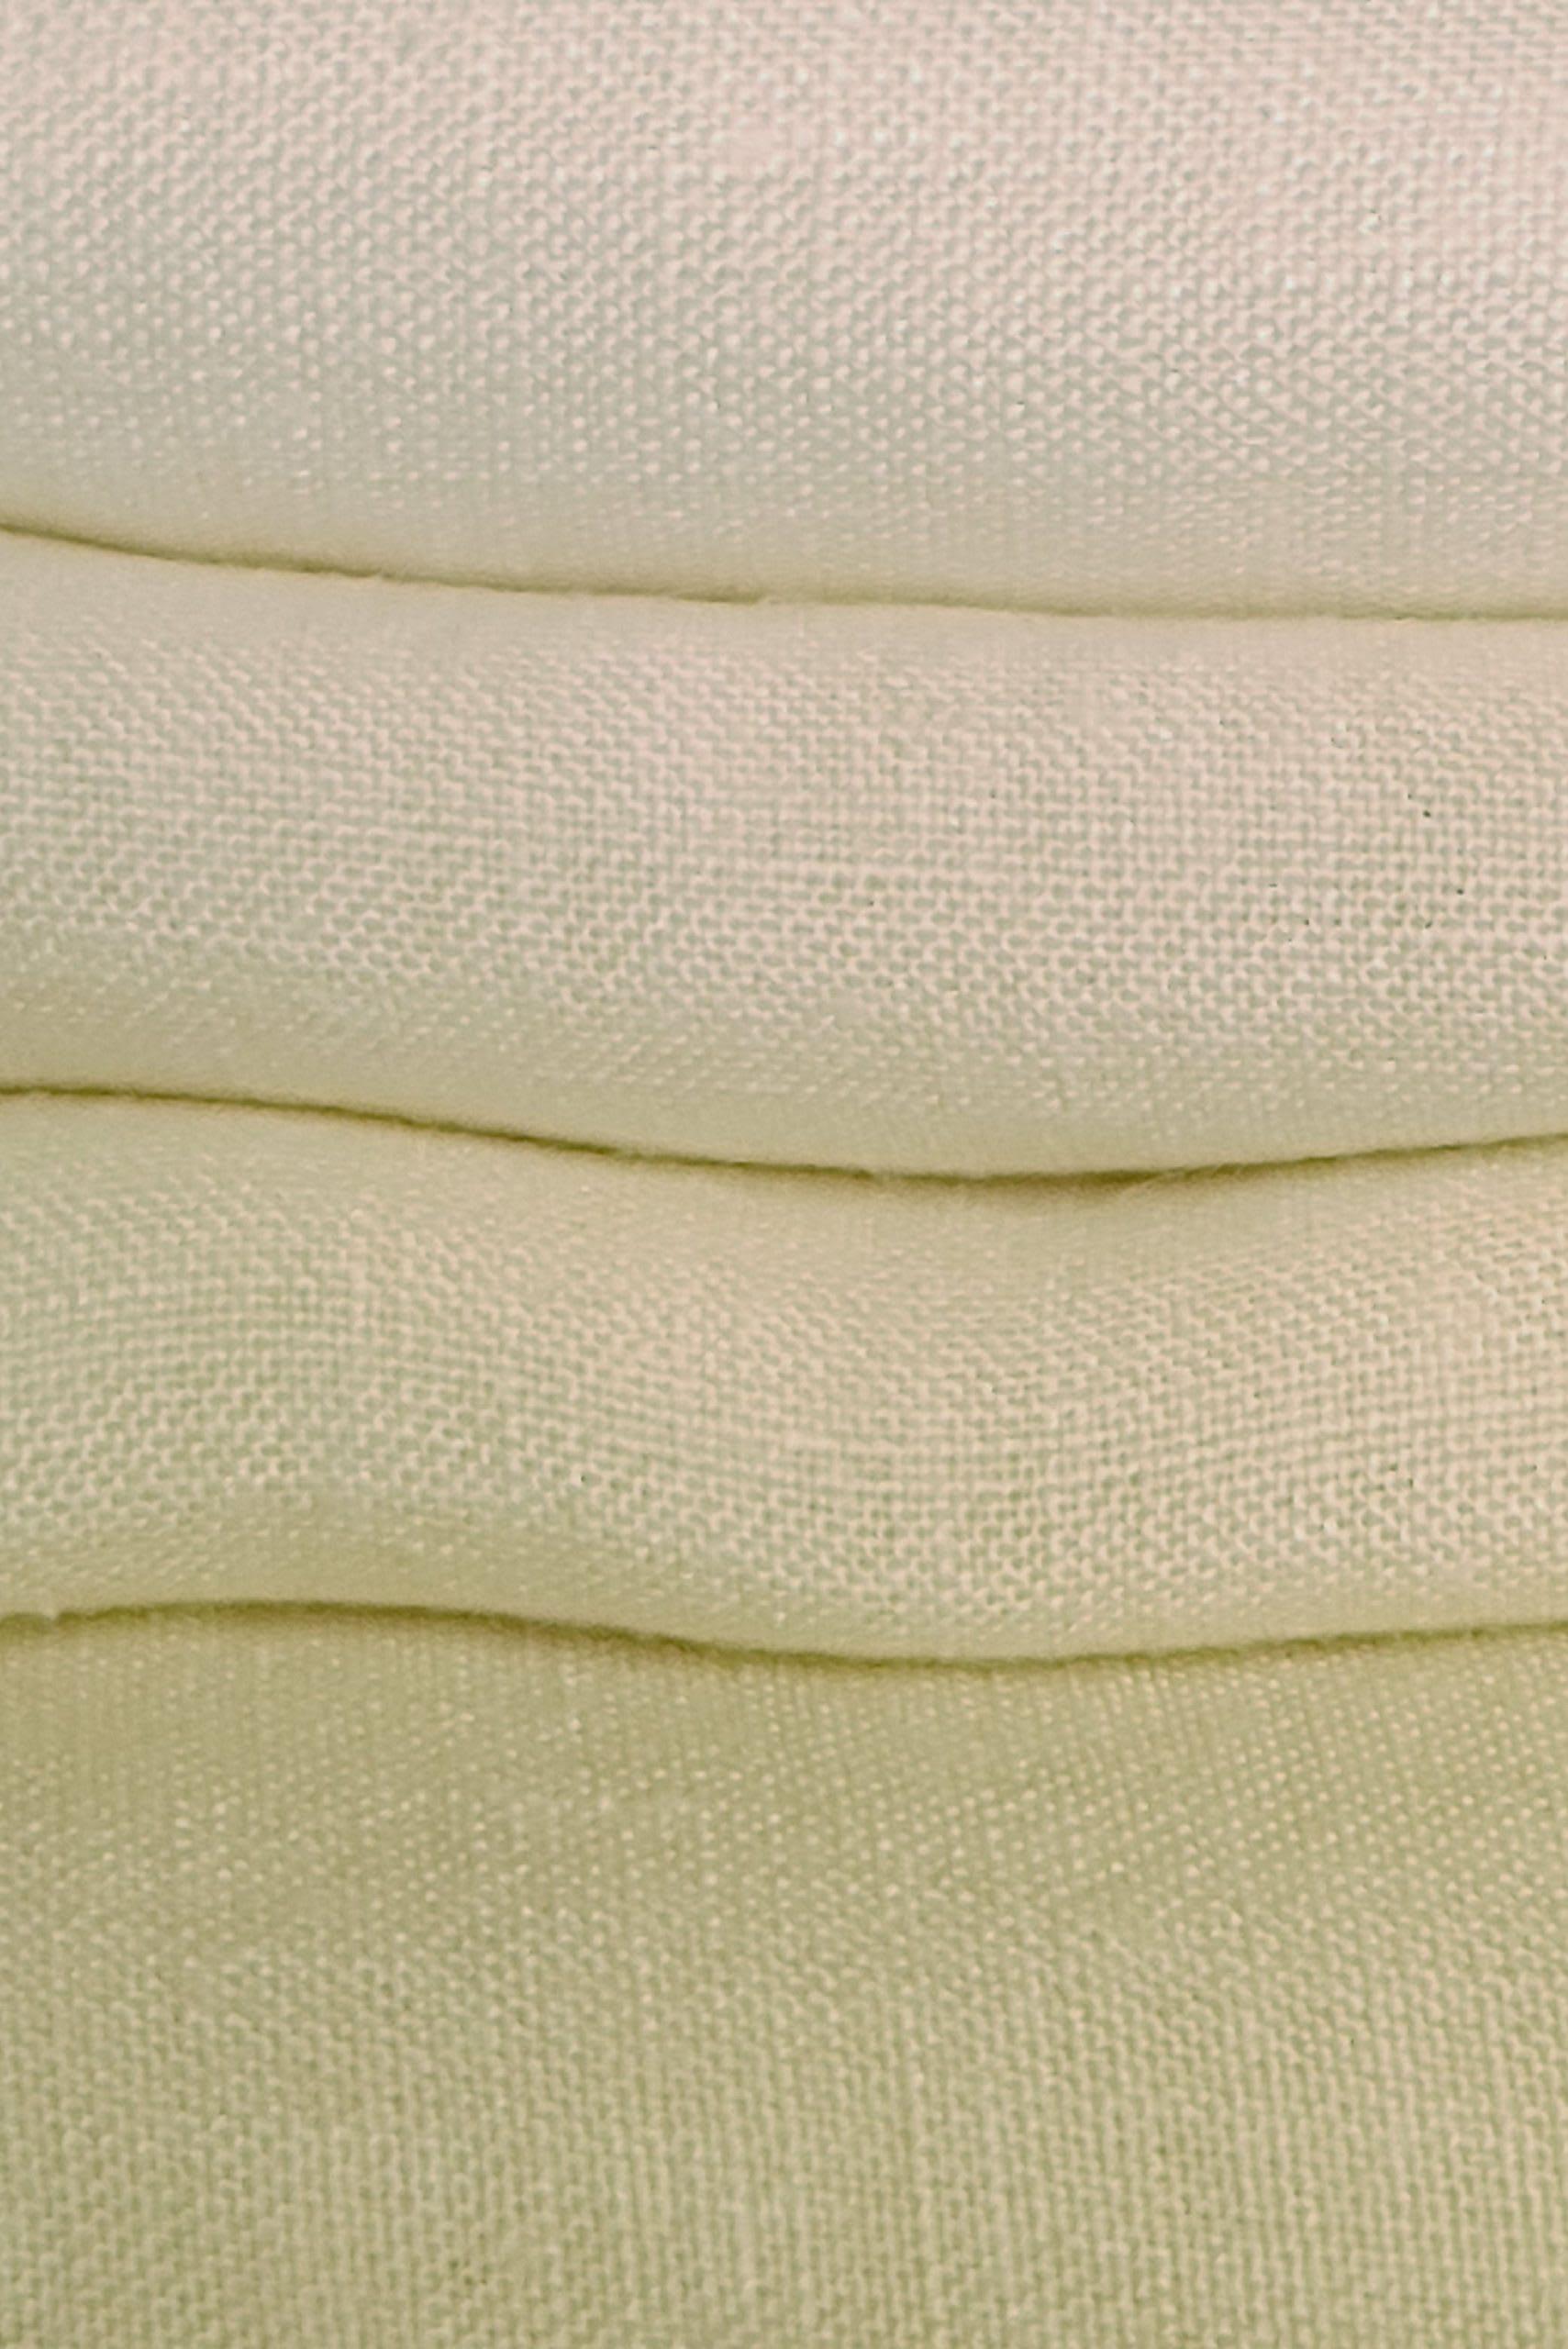 detail of linen hand dyed Dylon sandy beige